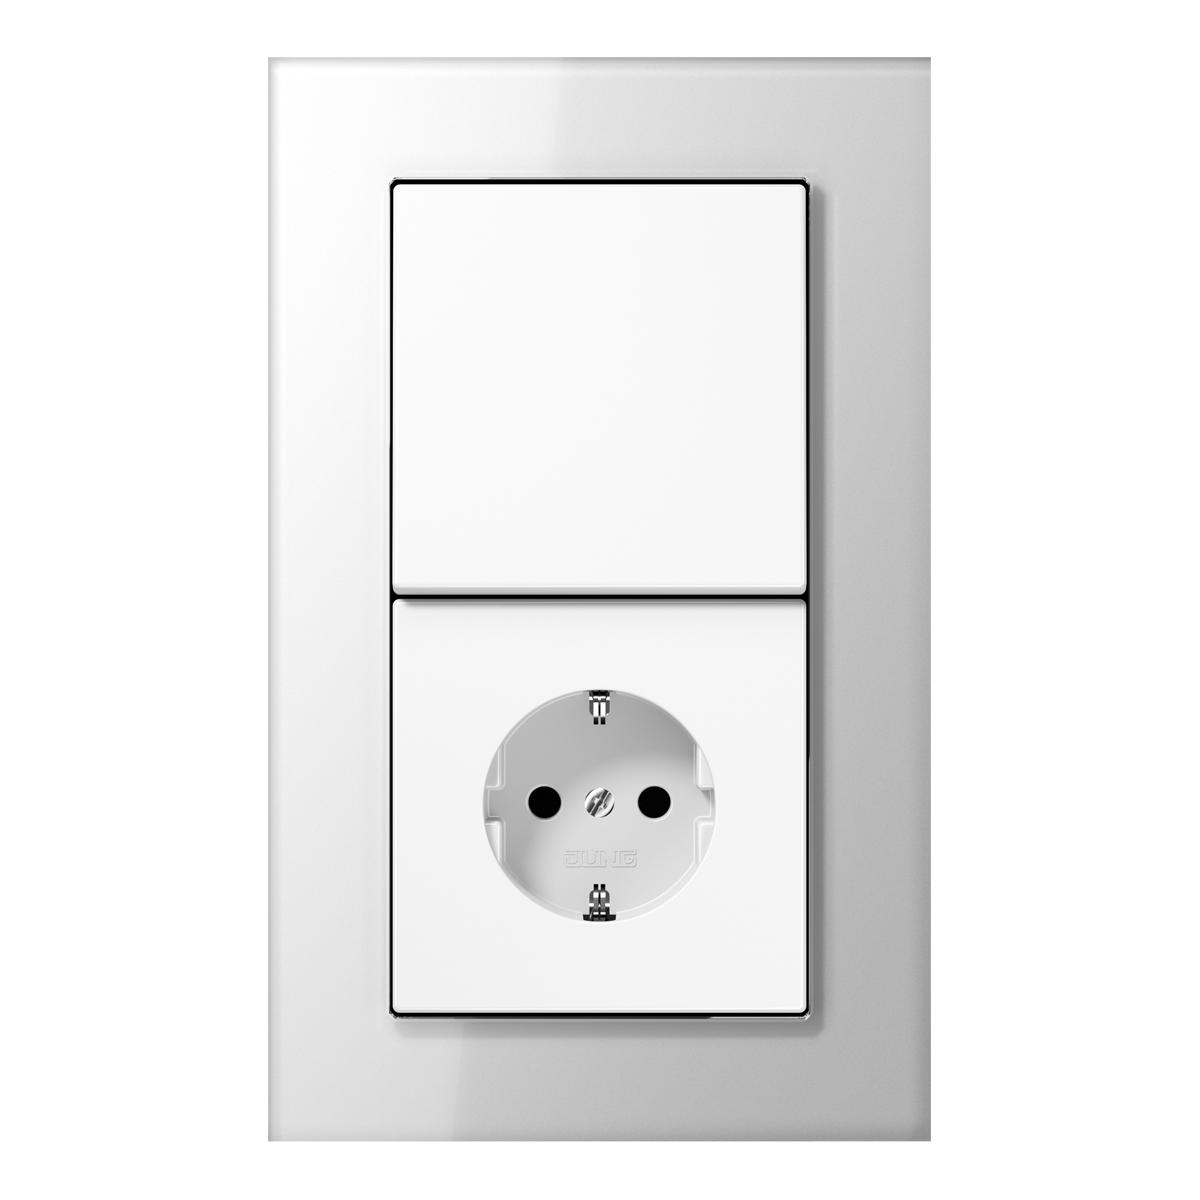 LS plus switch-socket GL white - на 360.ru: цены, описание, характеристики, где купить в Москве.